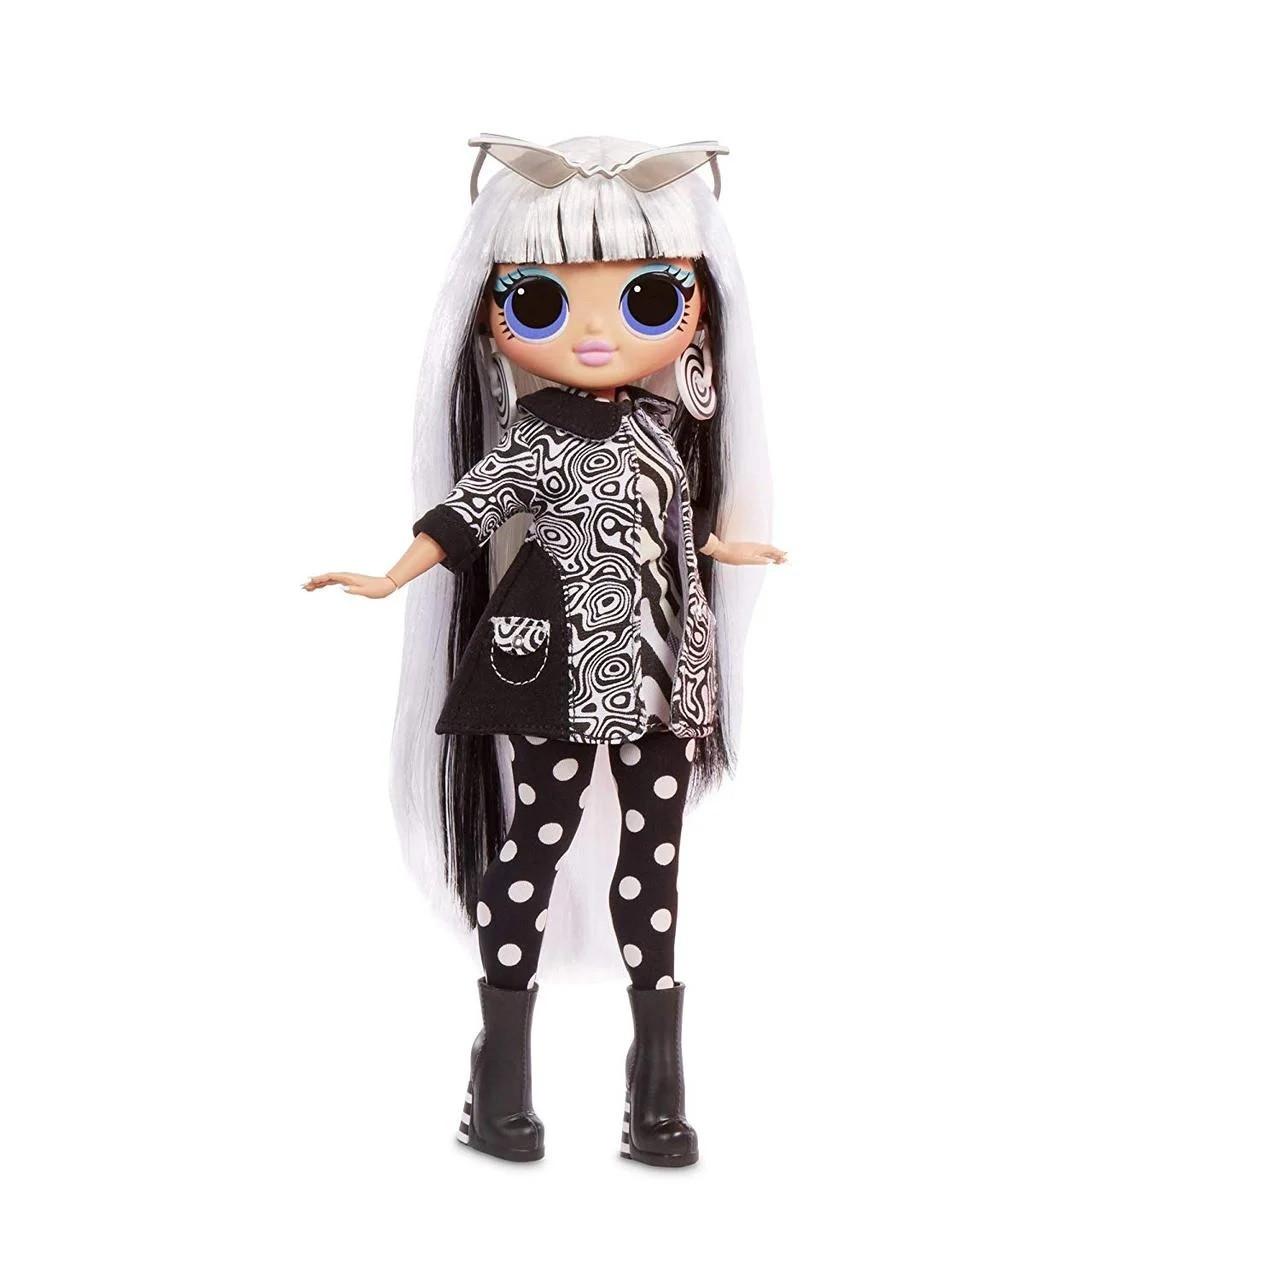 L.O.L. Surprise! OMG Lights - Groovy Babe Fashion Doll with 15 Surprises (Прекрасная Леди), 6+ (565154)